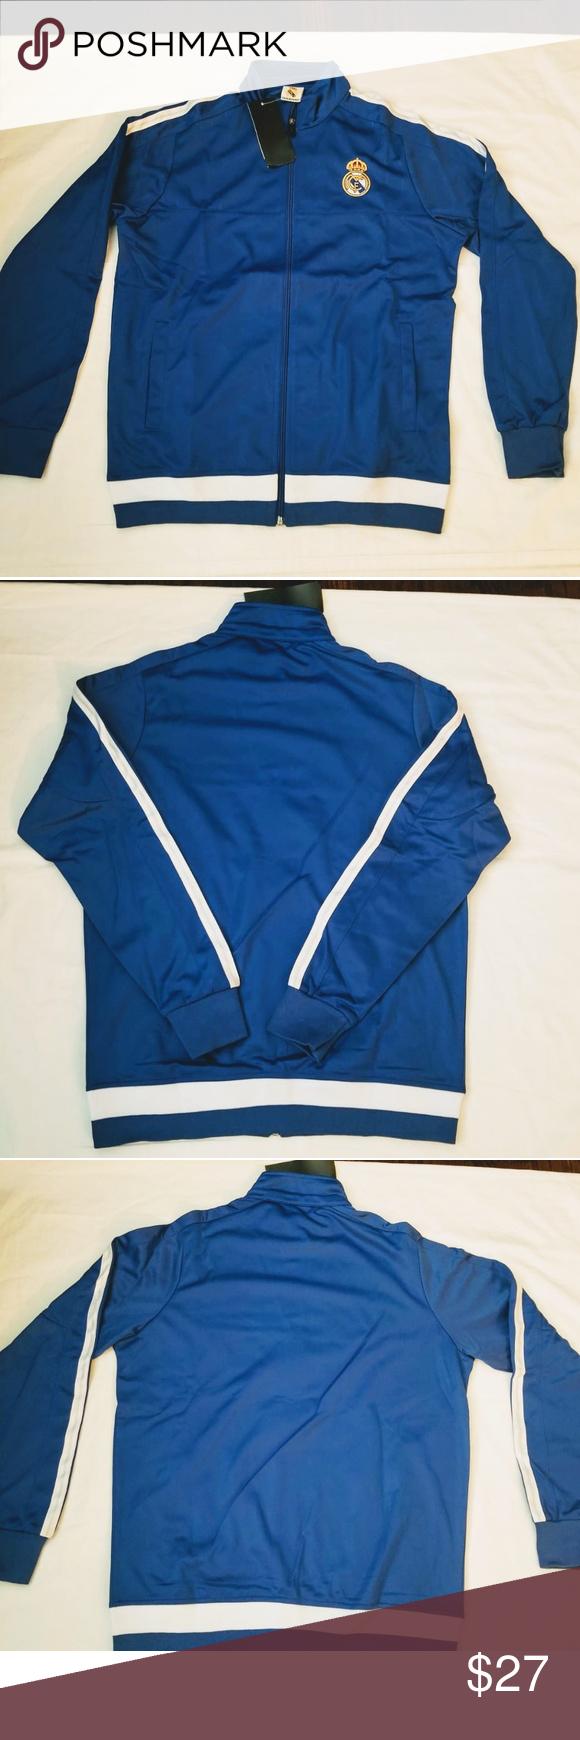 Real Madrid track jacket adult sizes Track jacket Real Madrid Chamarra  Deportiva Blue color SPORTS Jackets   Coats 5f1775fa20f29